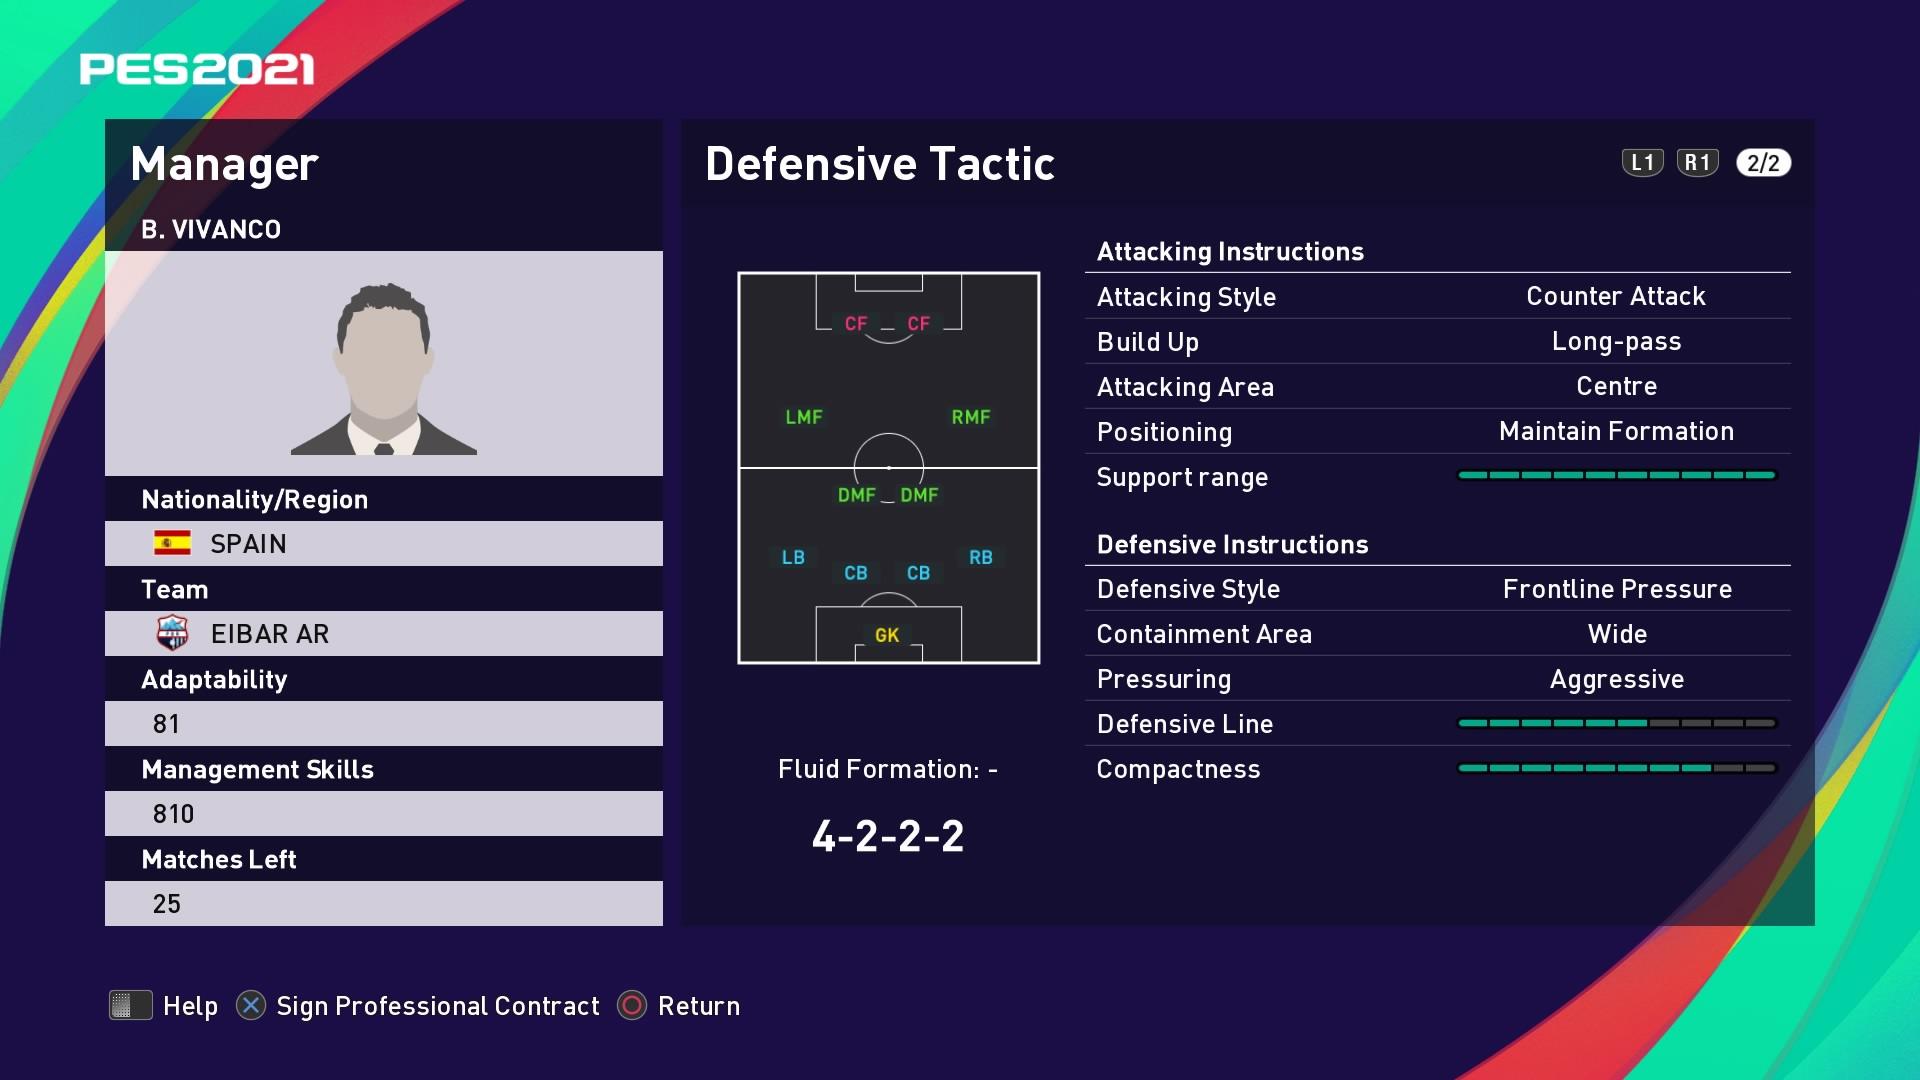 B. Vivanco (José Luis Mendilibar) Defensive Tactic in PES 2021 myClub